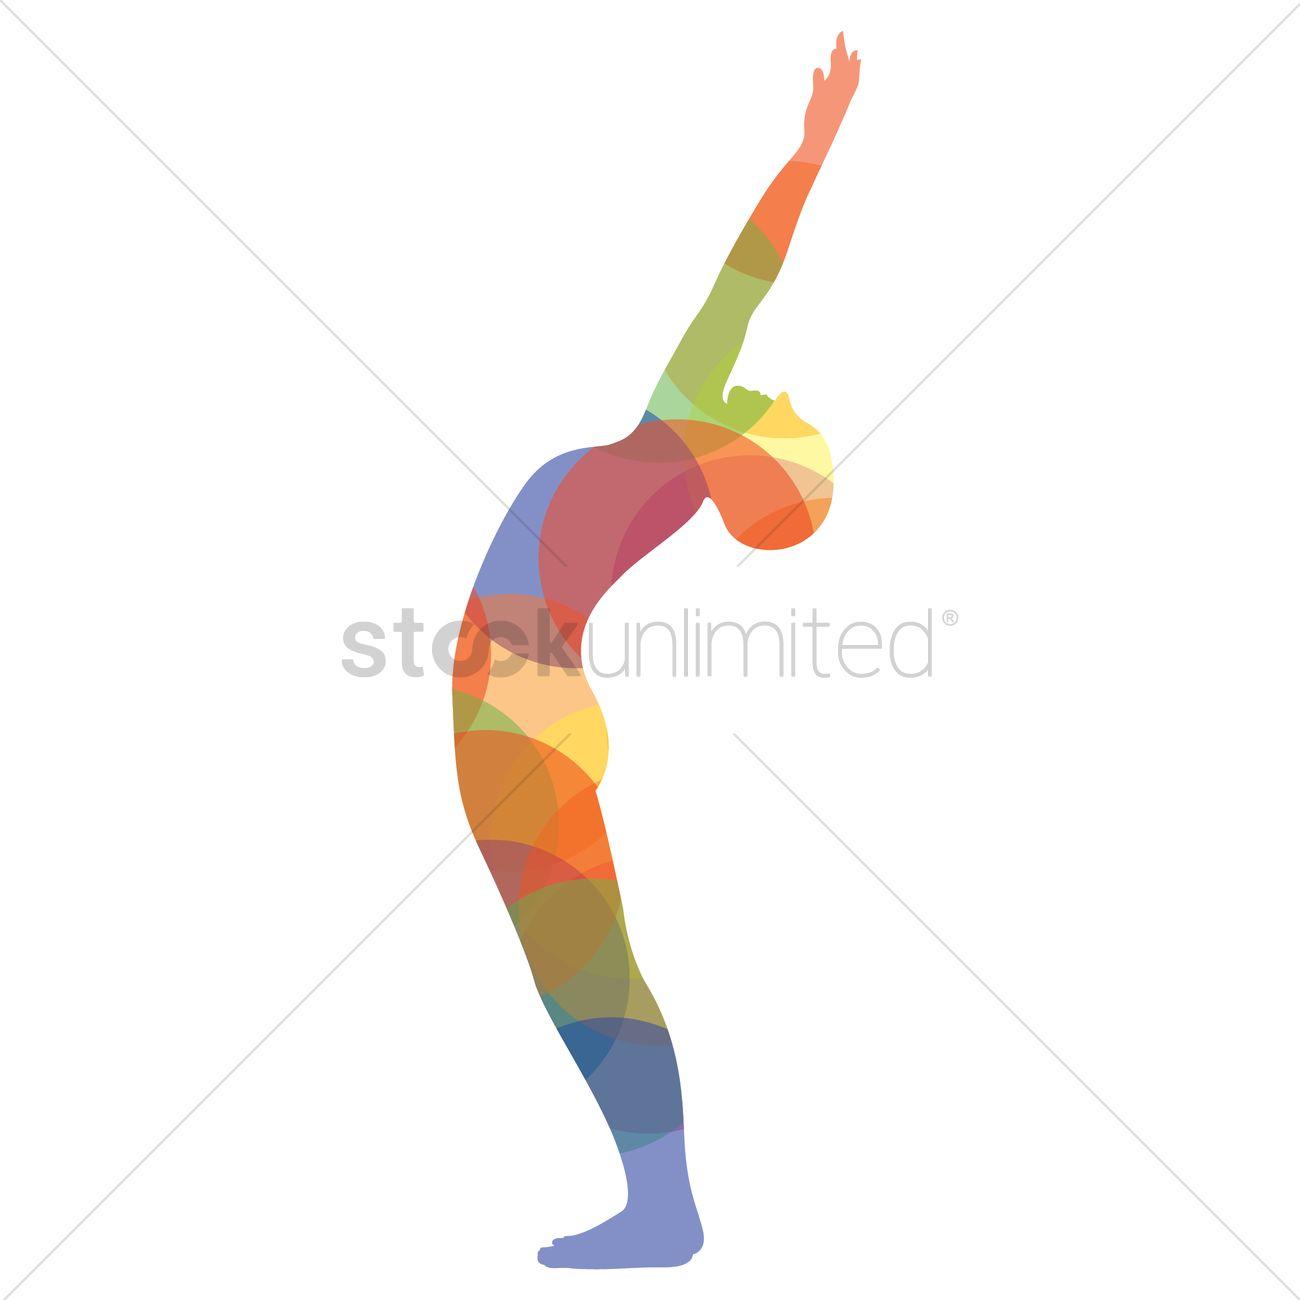 Man Silhouette Practising Yoga In Upward Salute Pose Vector Graphic